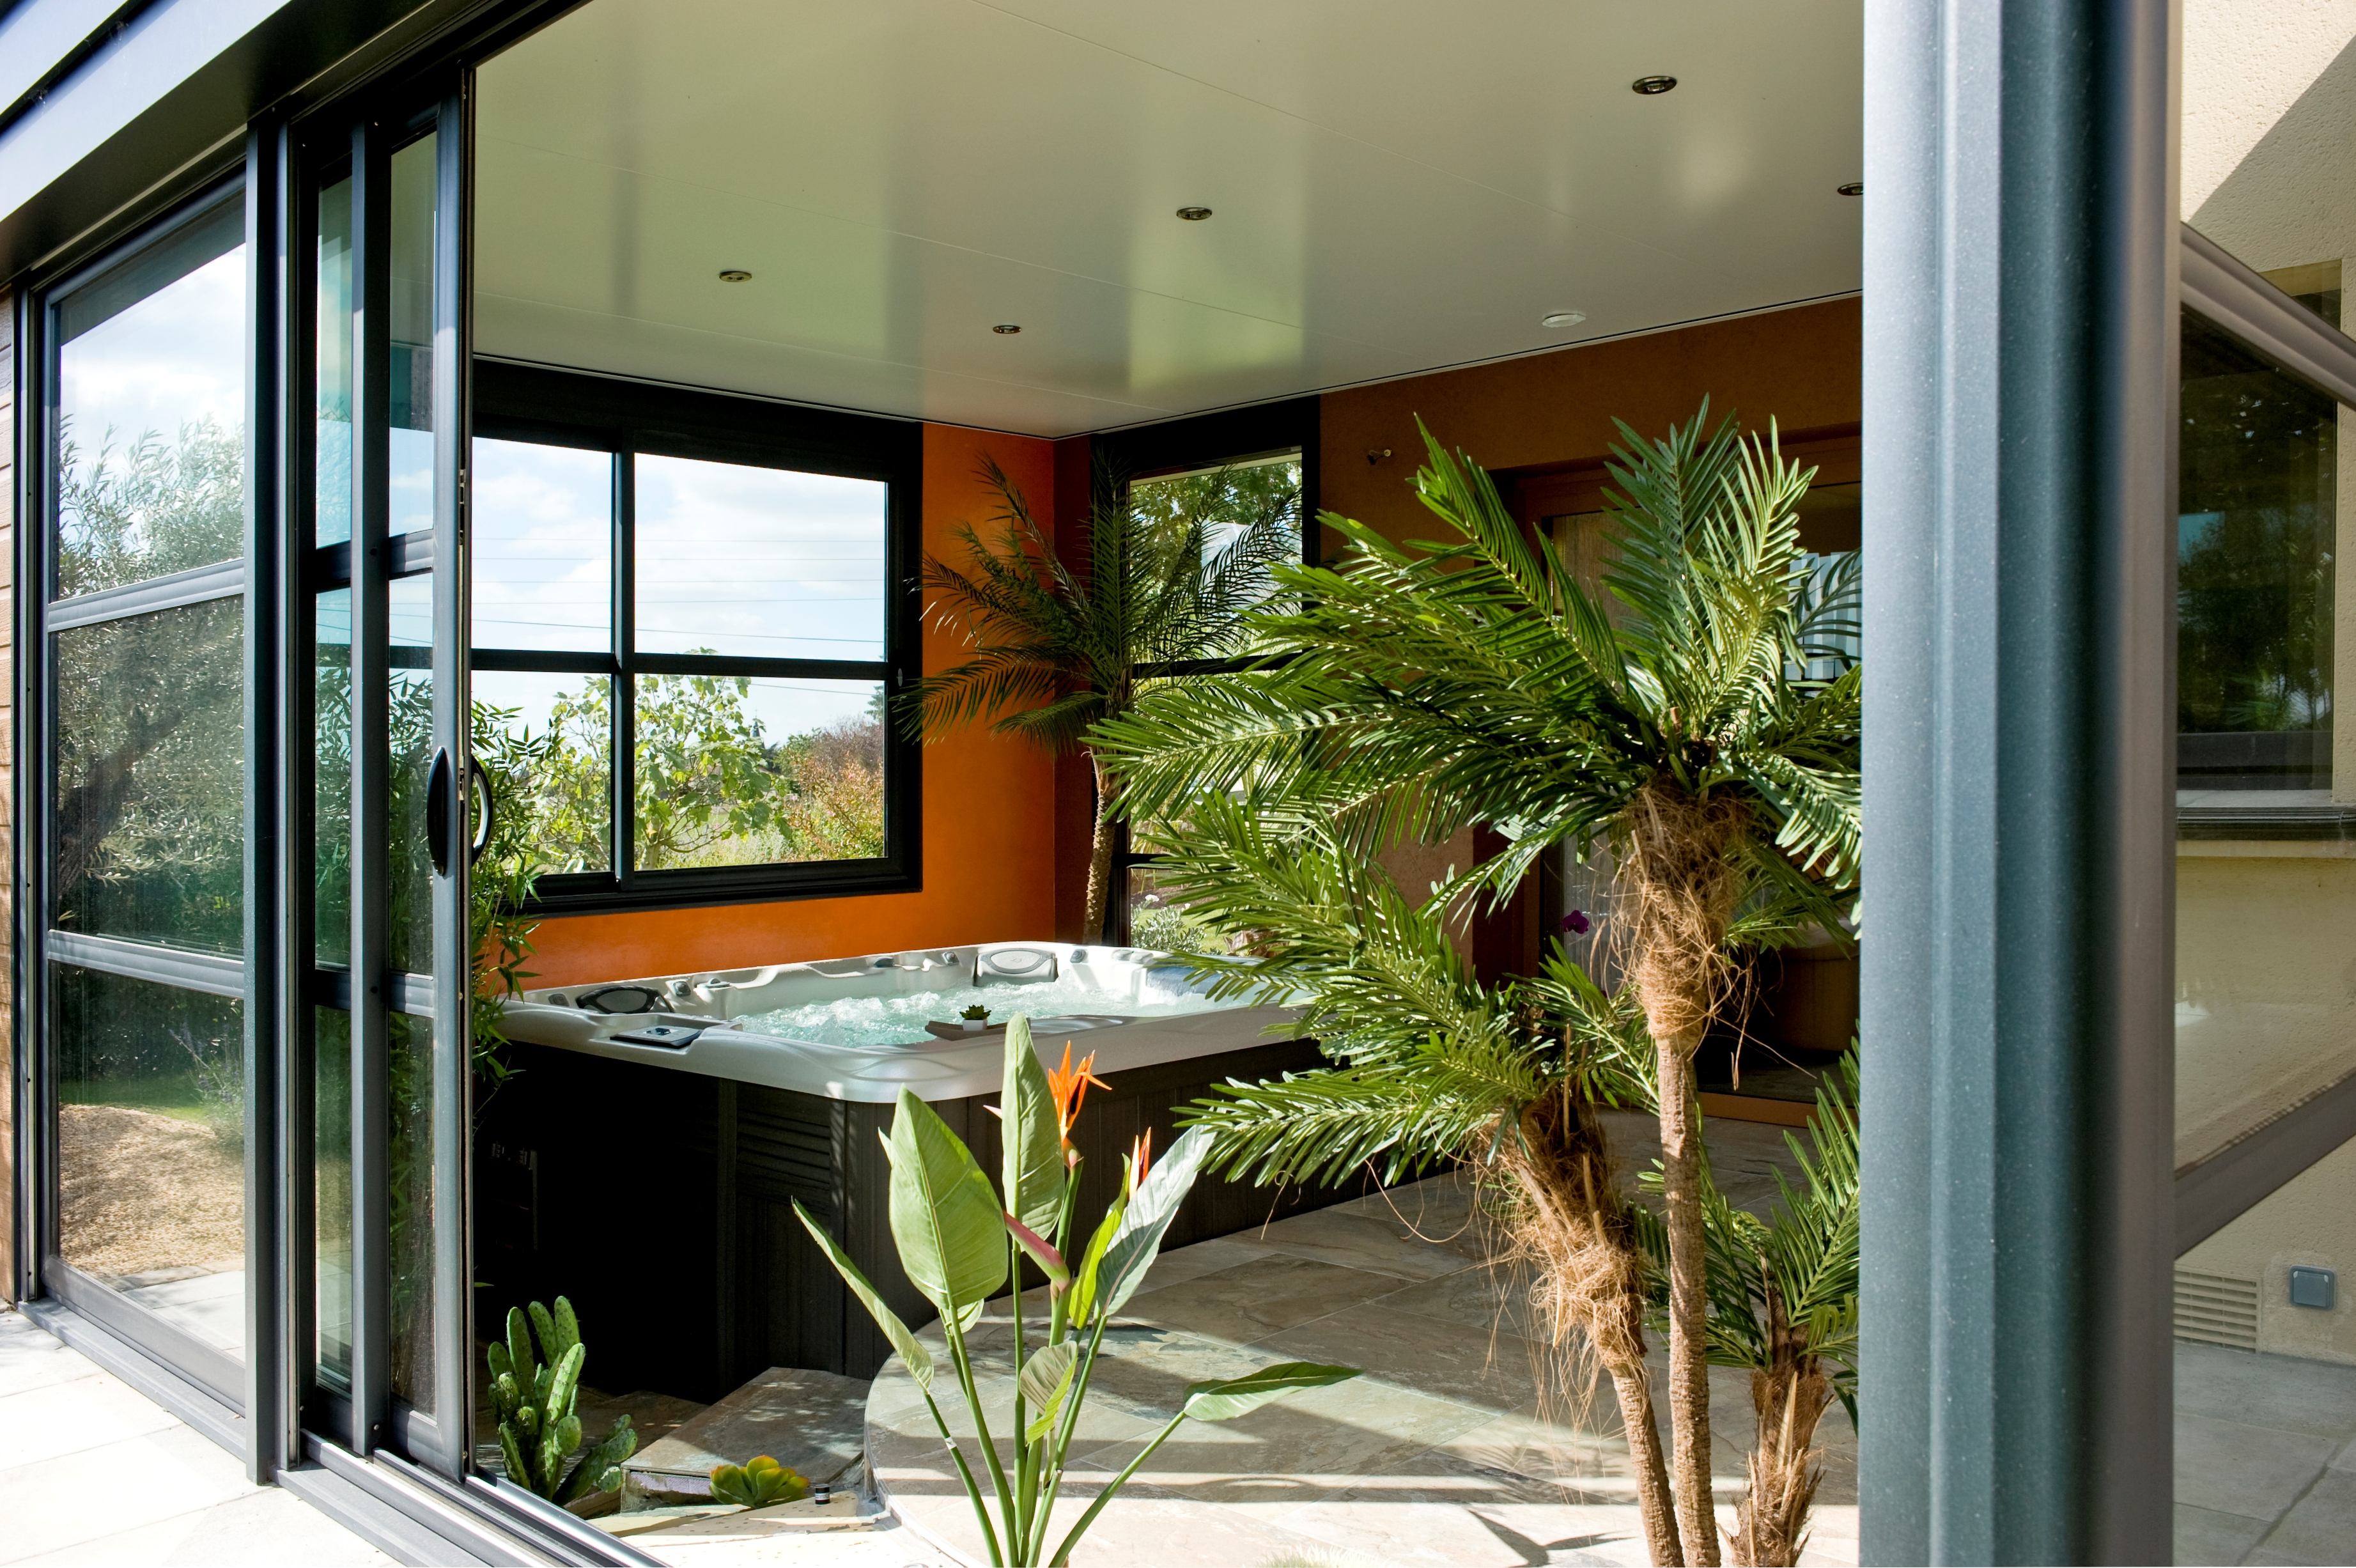 Abri Veranda Pour Spa reno11150 - ecologis experts